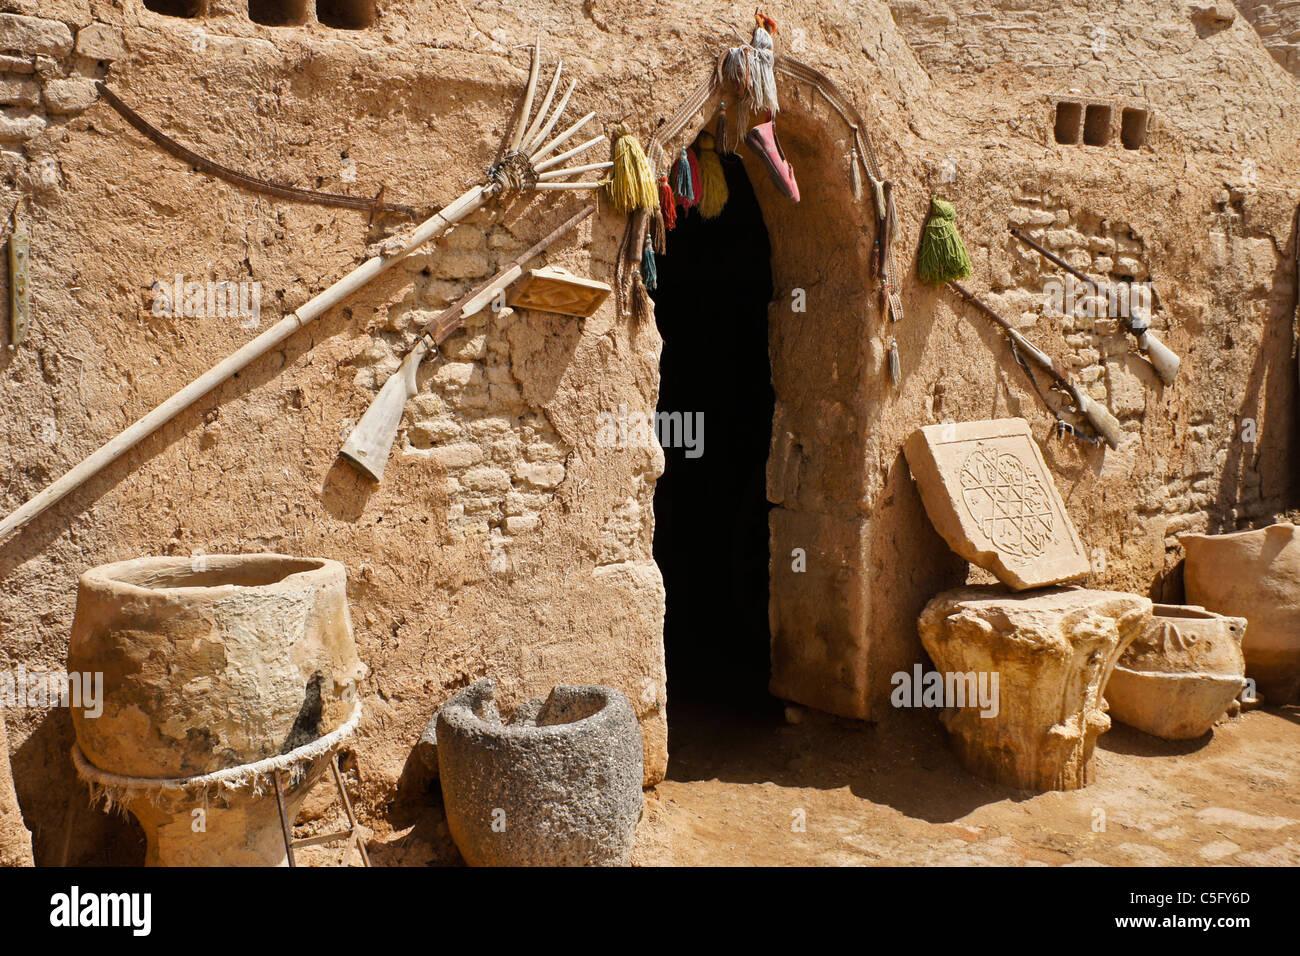 Old implements at mud-brick beehive house, Harran (Altinbasak), Eastern Anatolia, Turkey - Stock Image